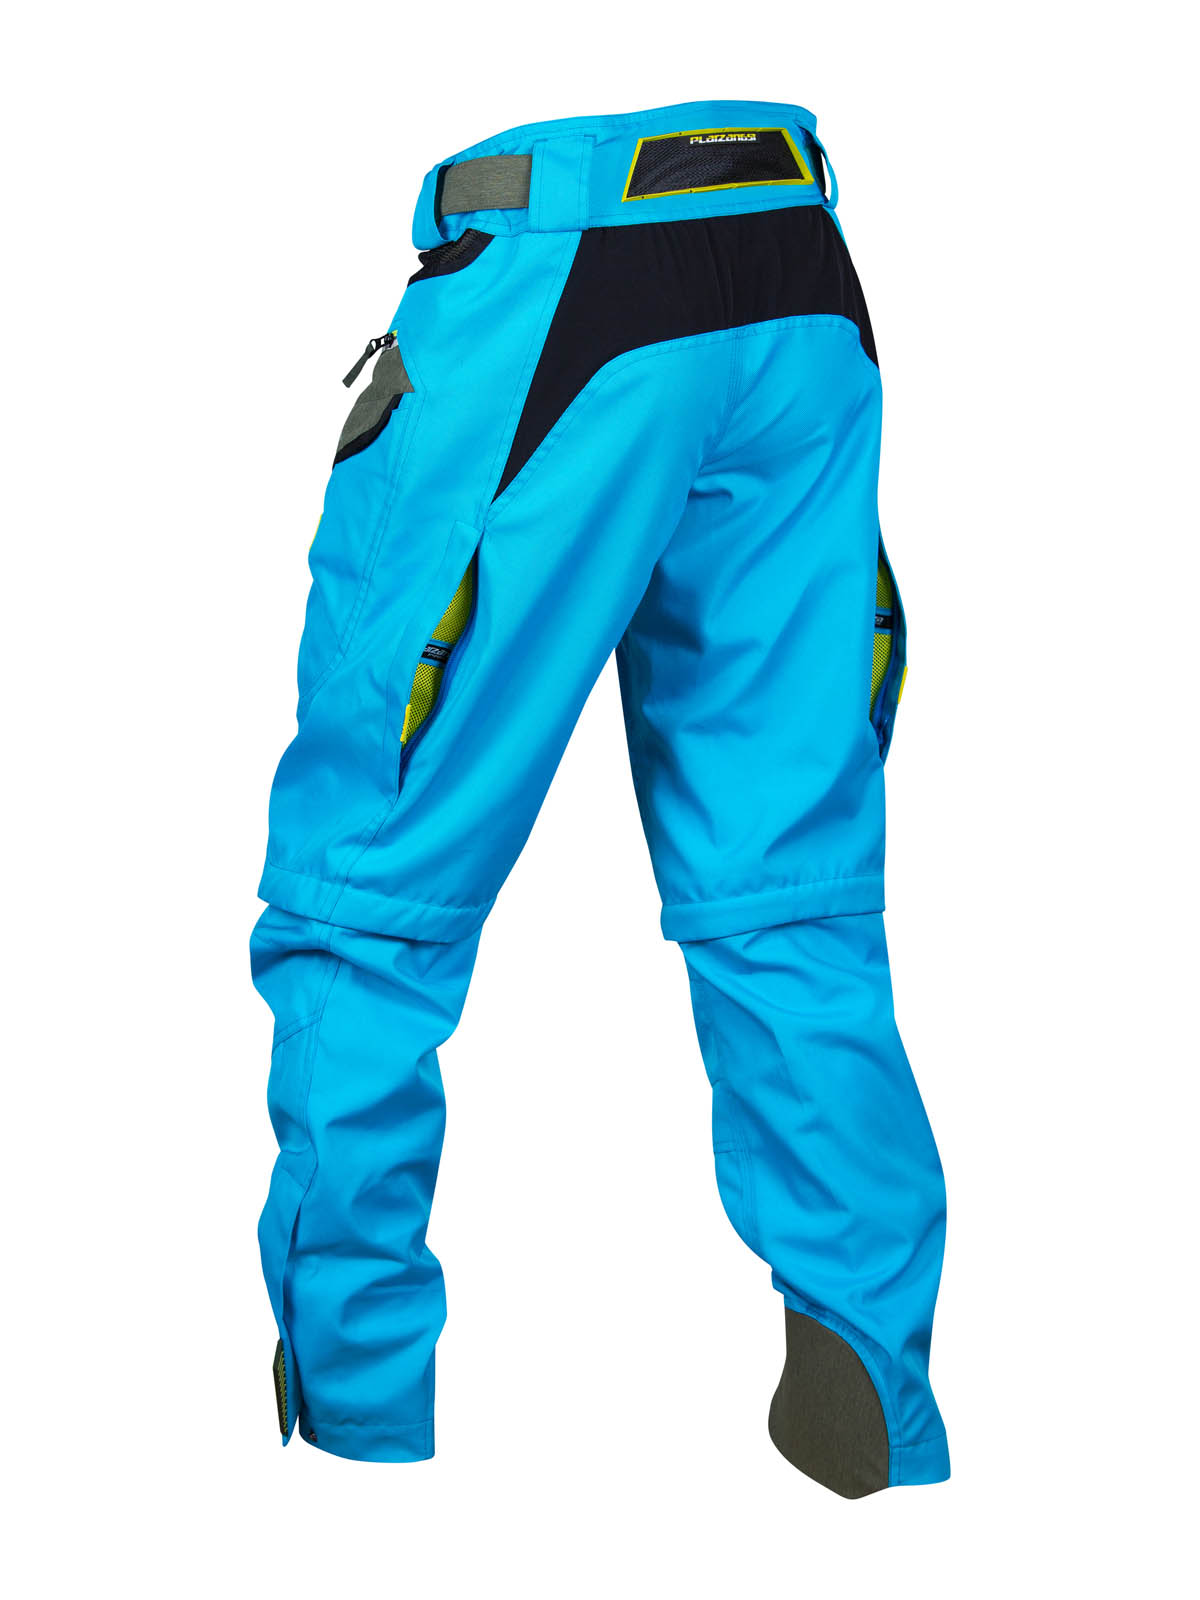 platzangst Bulldog II Fahrradhose Herren Hose lang Blau MTB Pant